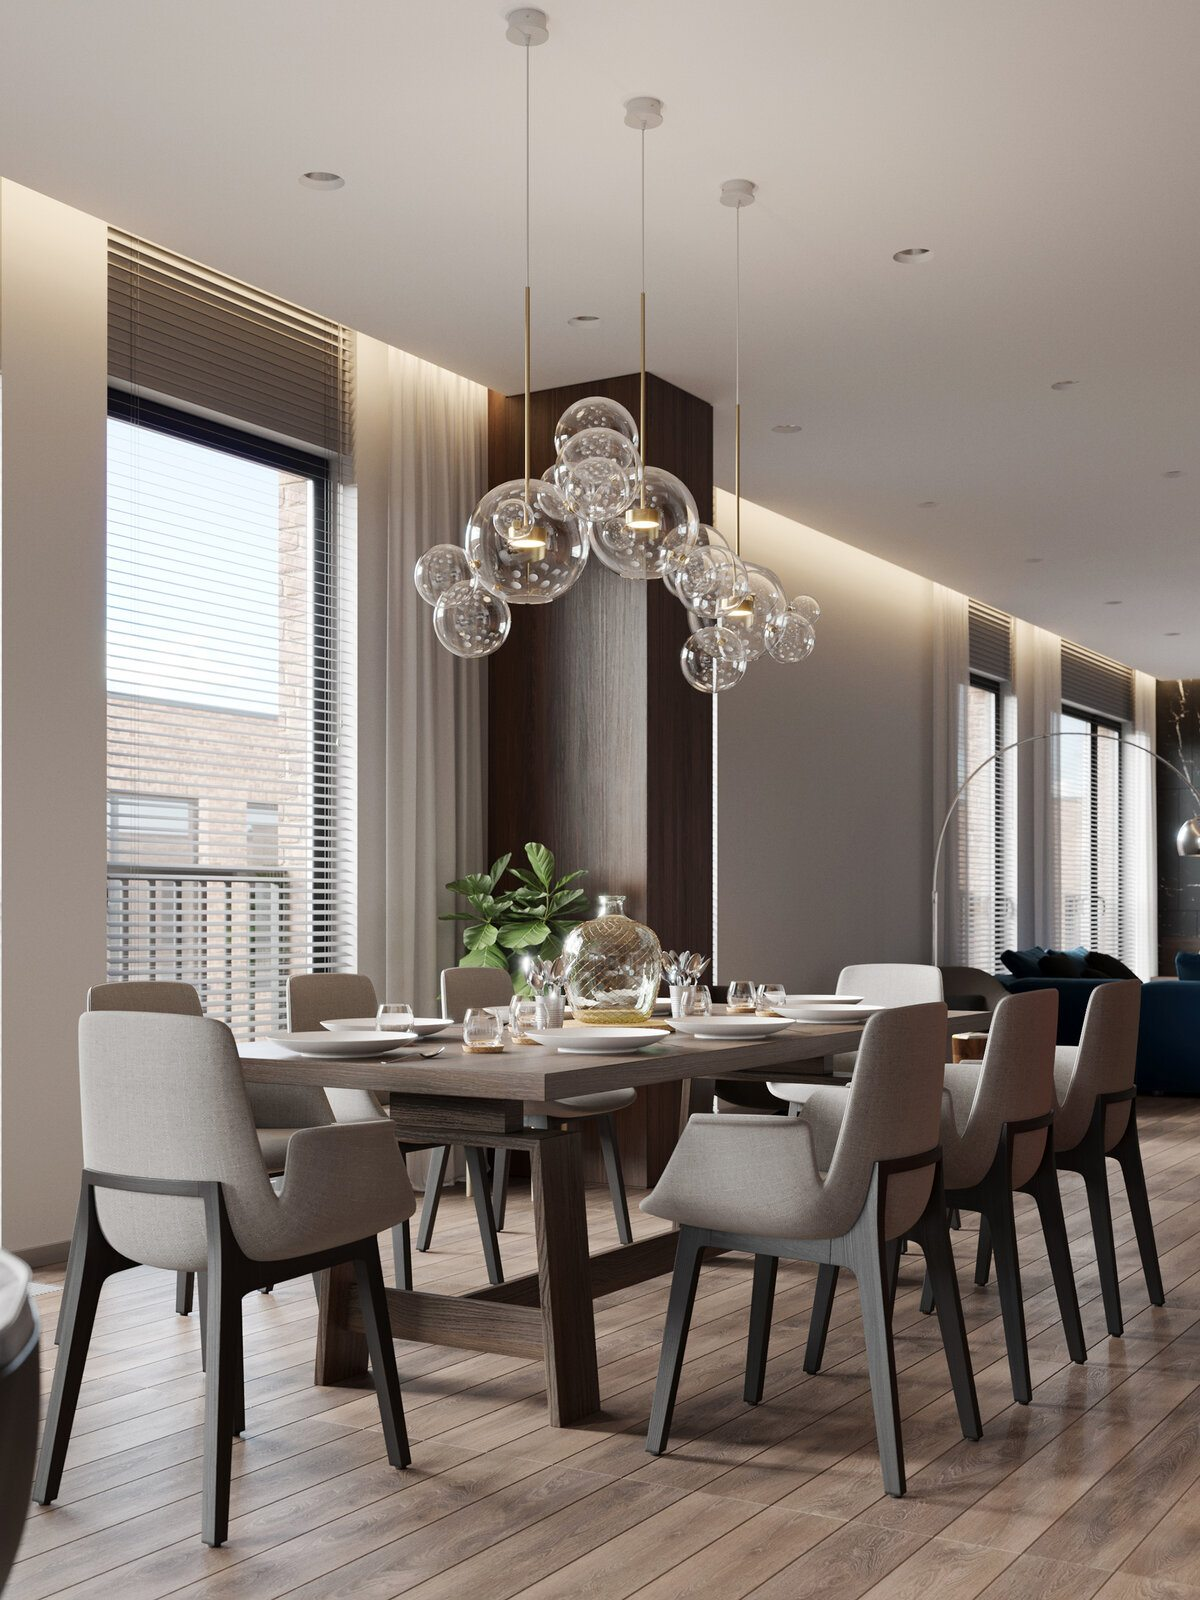 Glass bulbs chandelier over the large dinign table